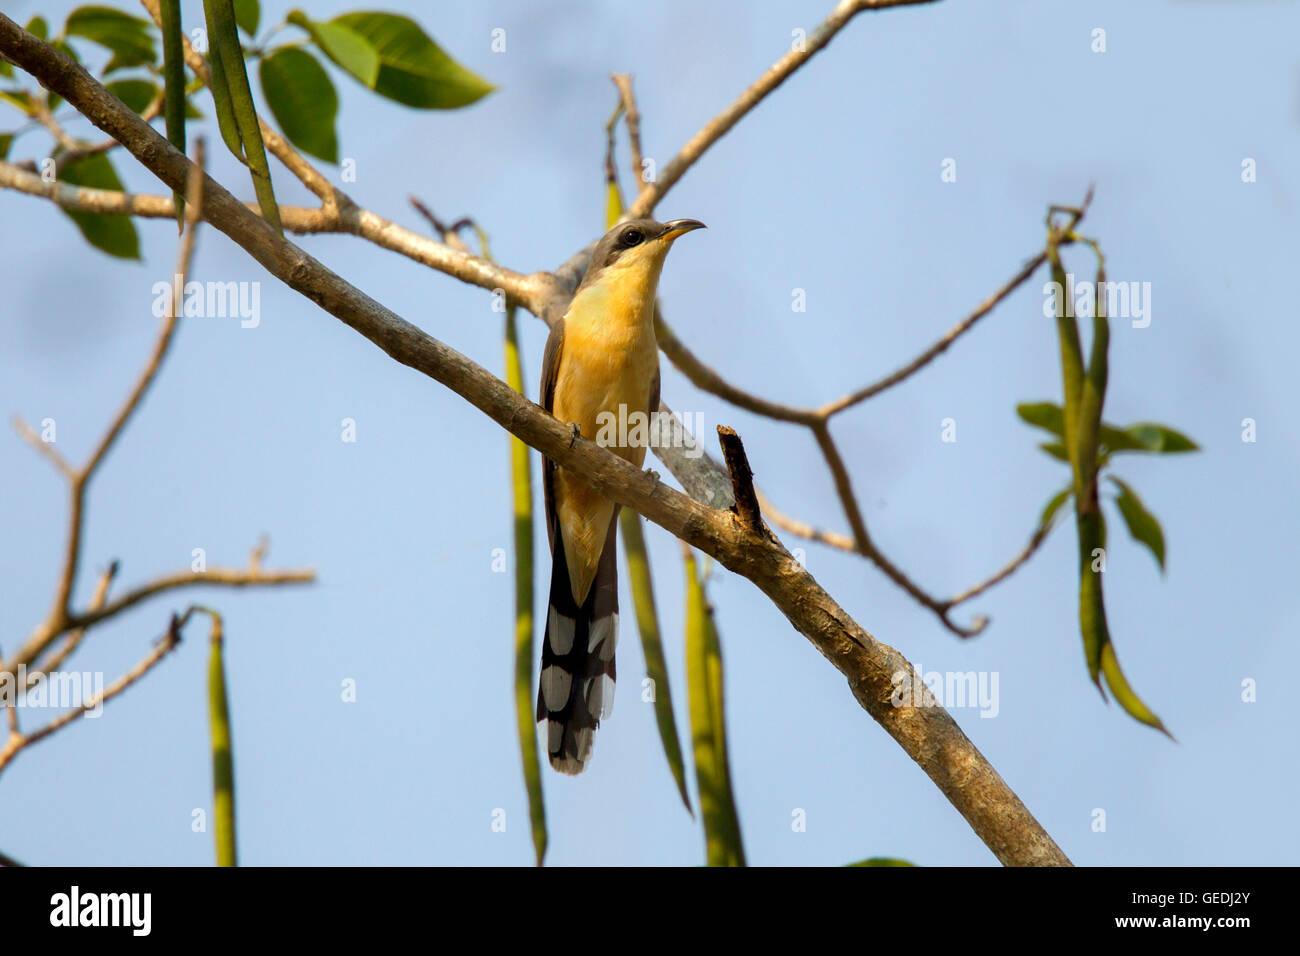 Mangrove Cuckoo  Coccyzus minor El Tuito, Jalisco, Mexico 13 June     Adult       Cuculidae - Stock Image